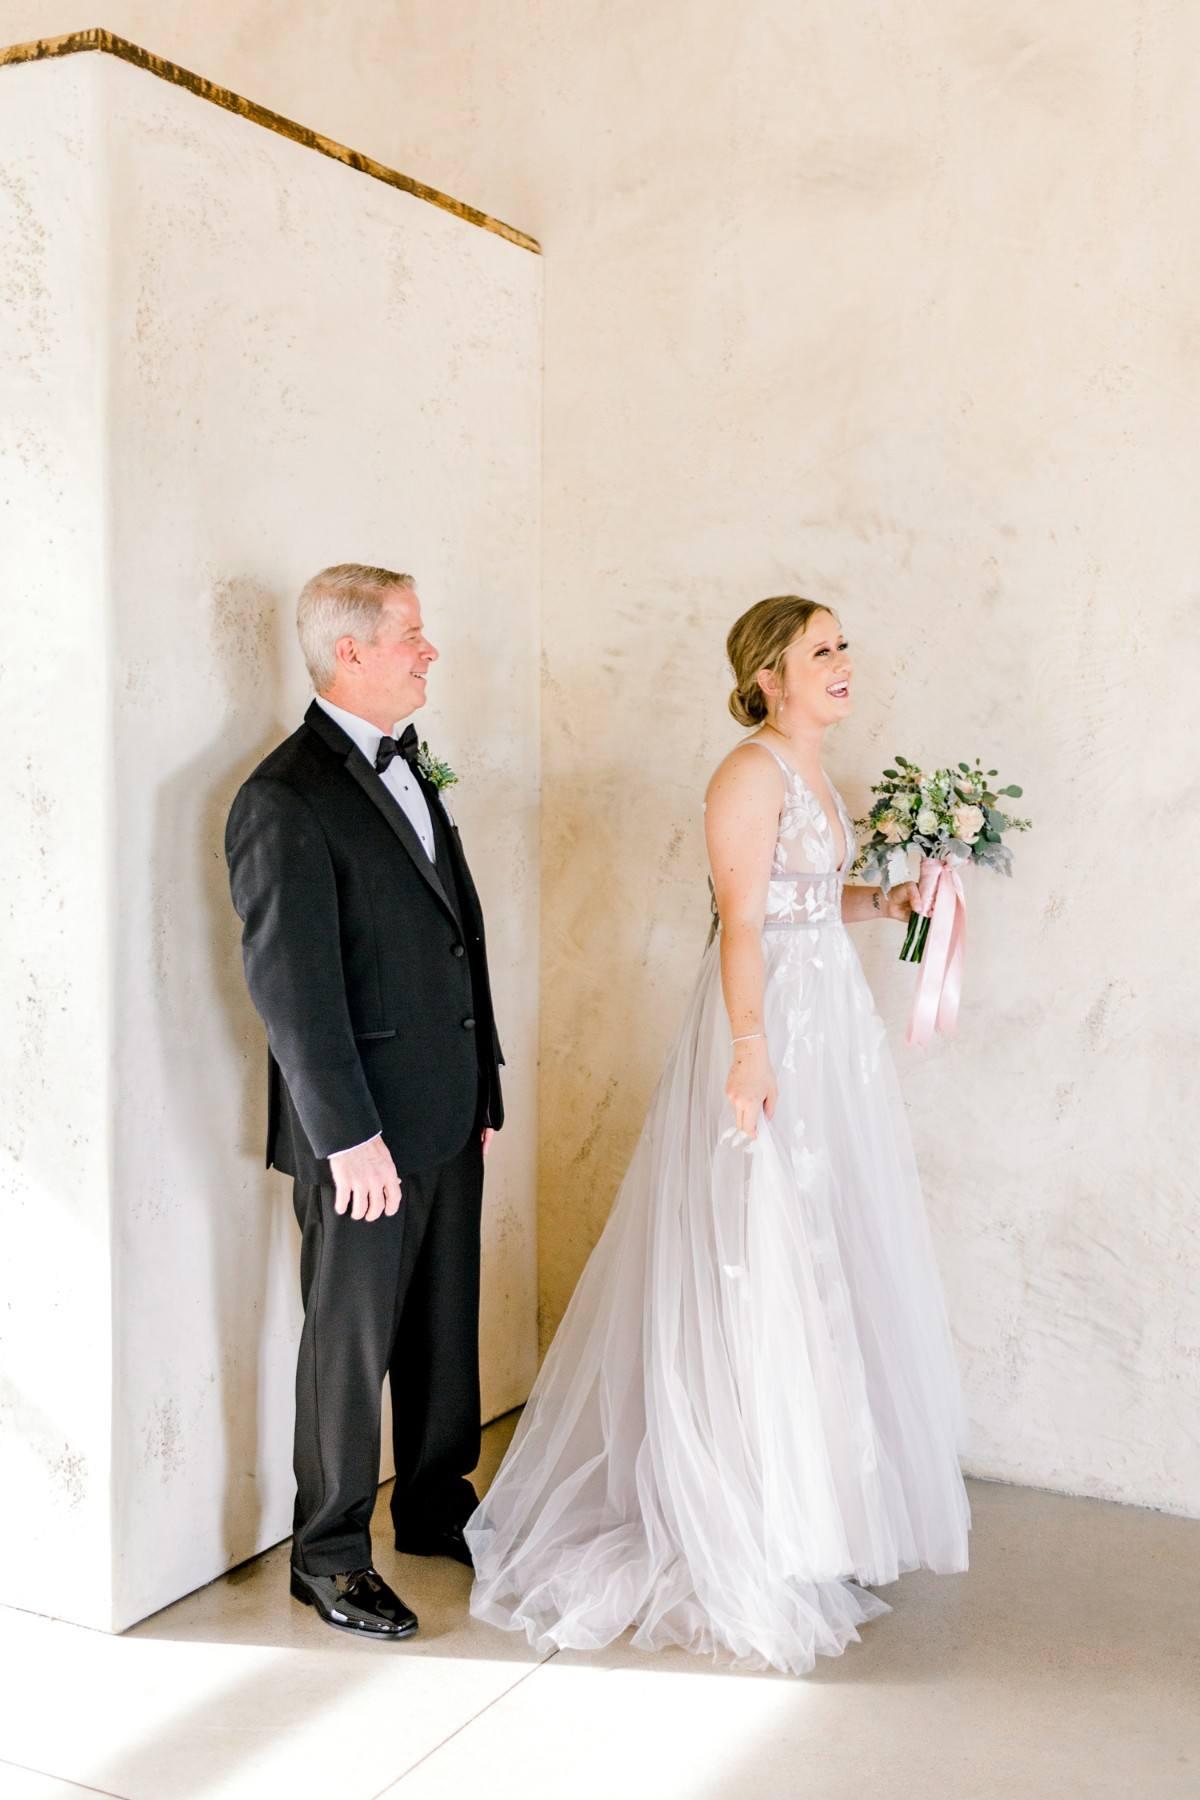 ennis-texas-wedding-photographer-kaitlyn-bullard-43.jpg